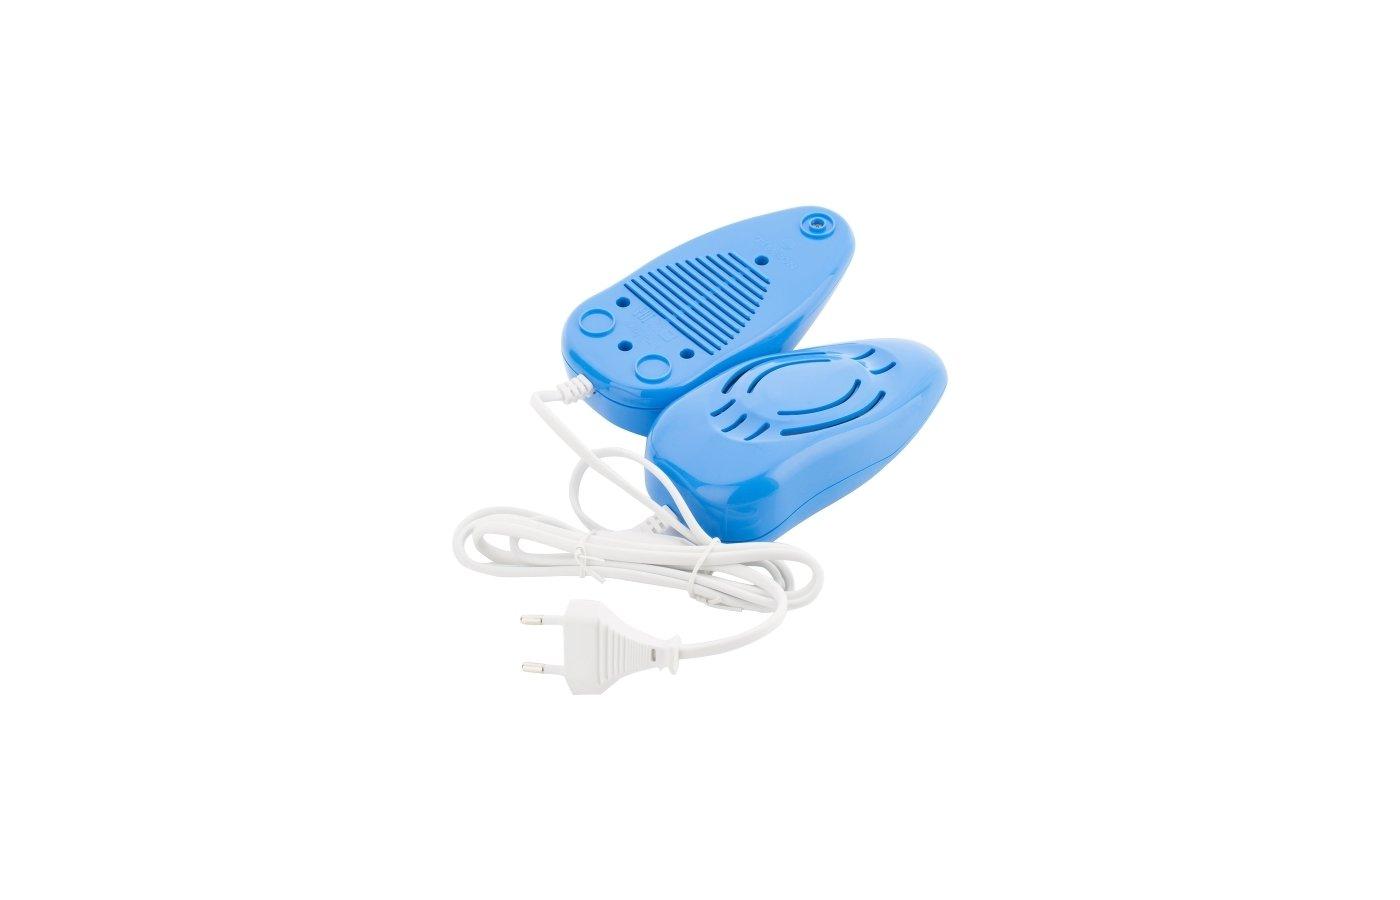 Сушилка для обуви ТИМСОН 2426 сушилка для обуви